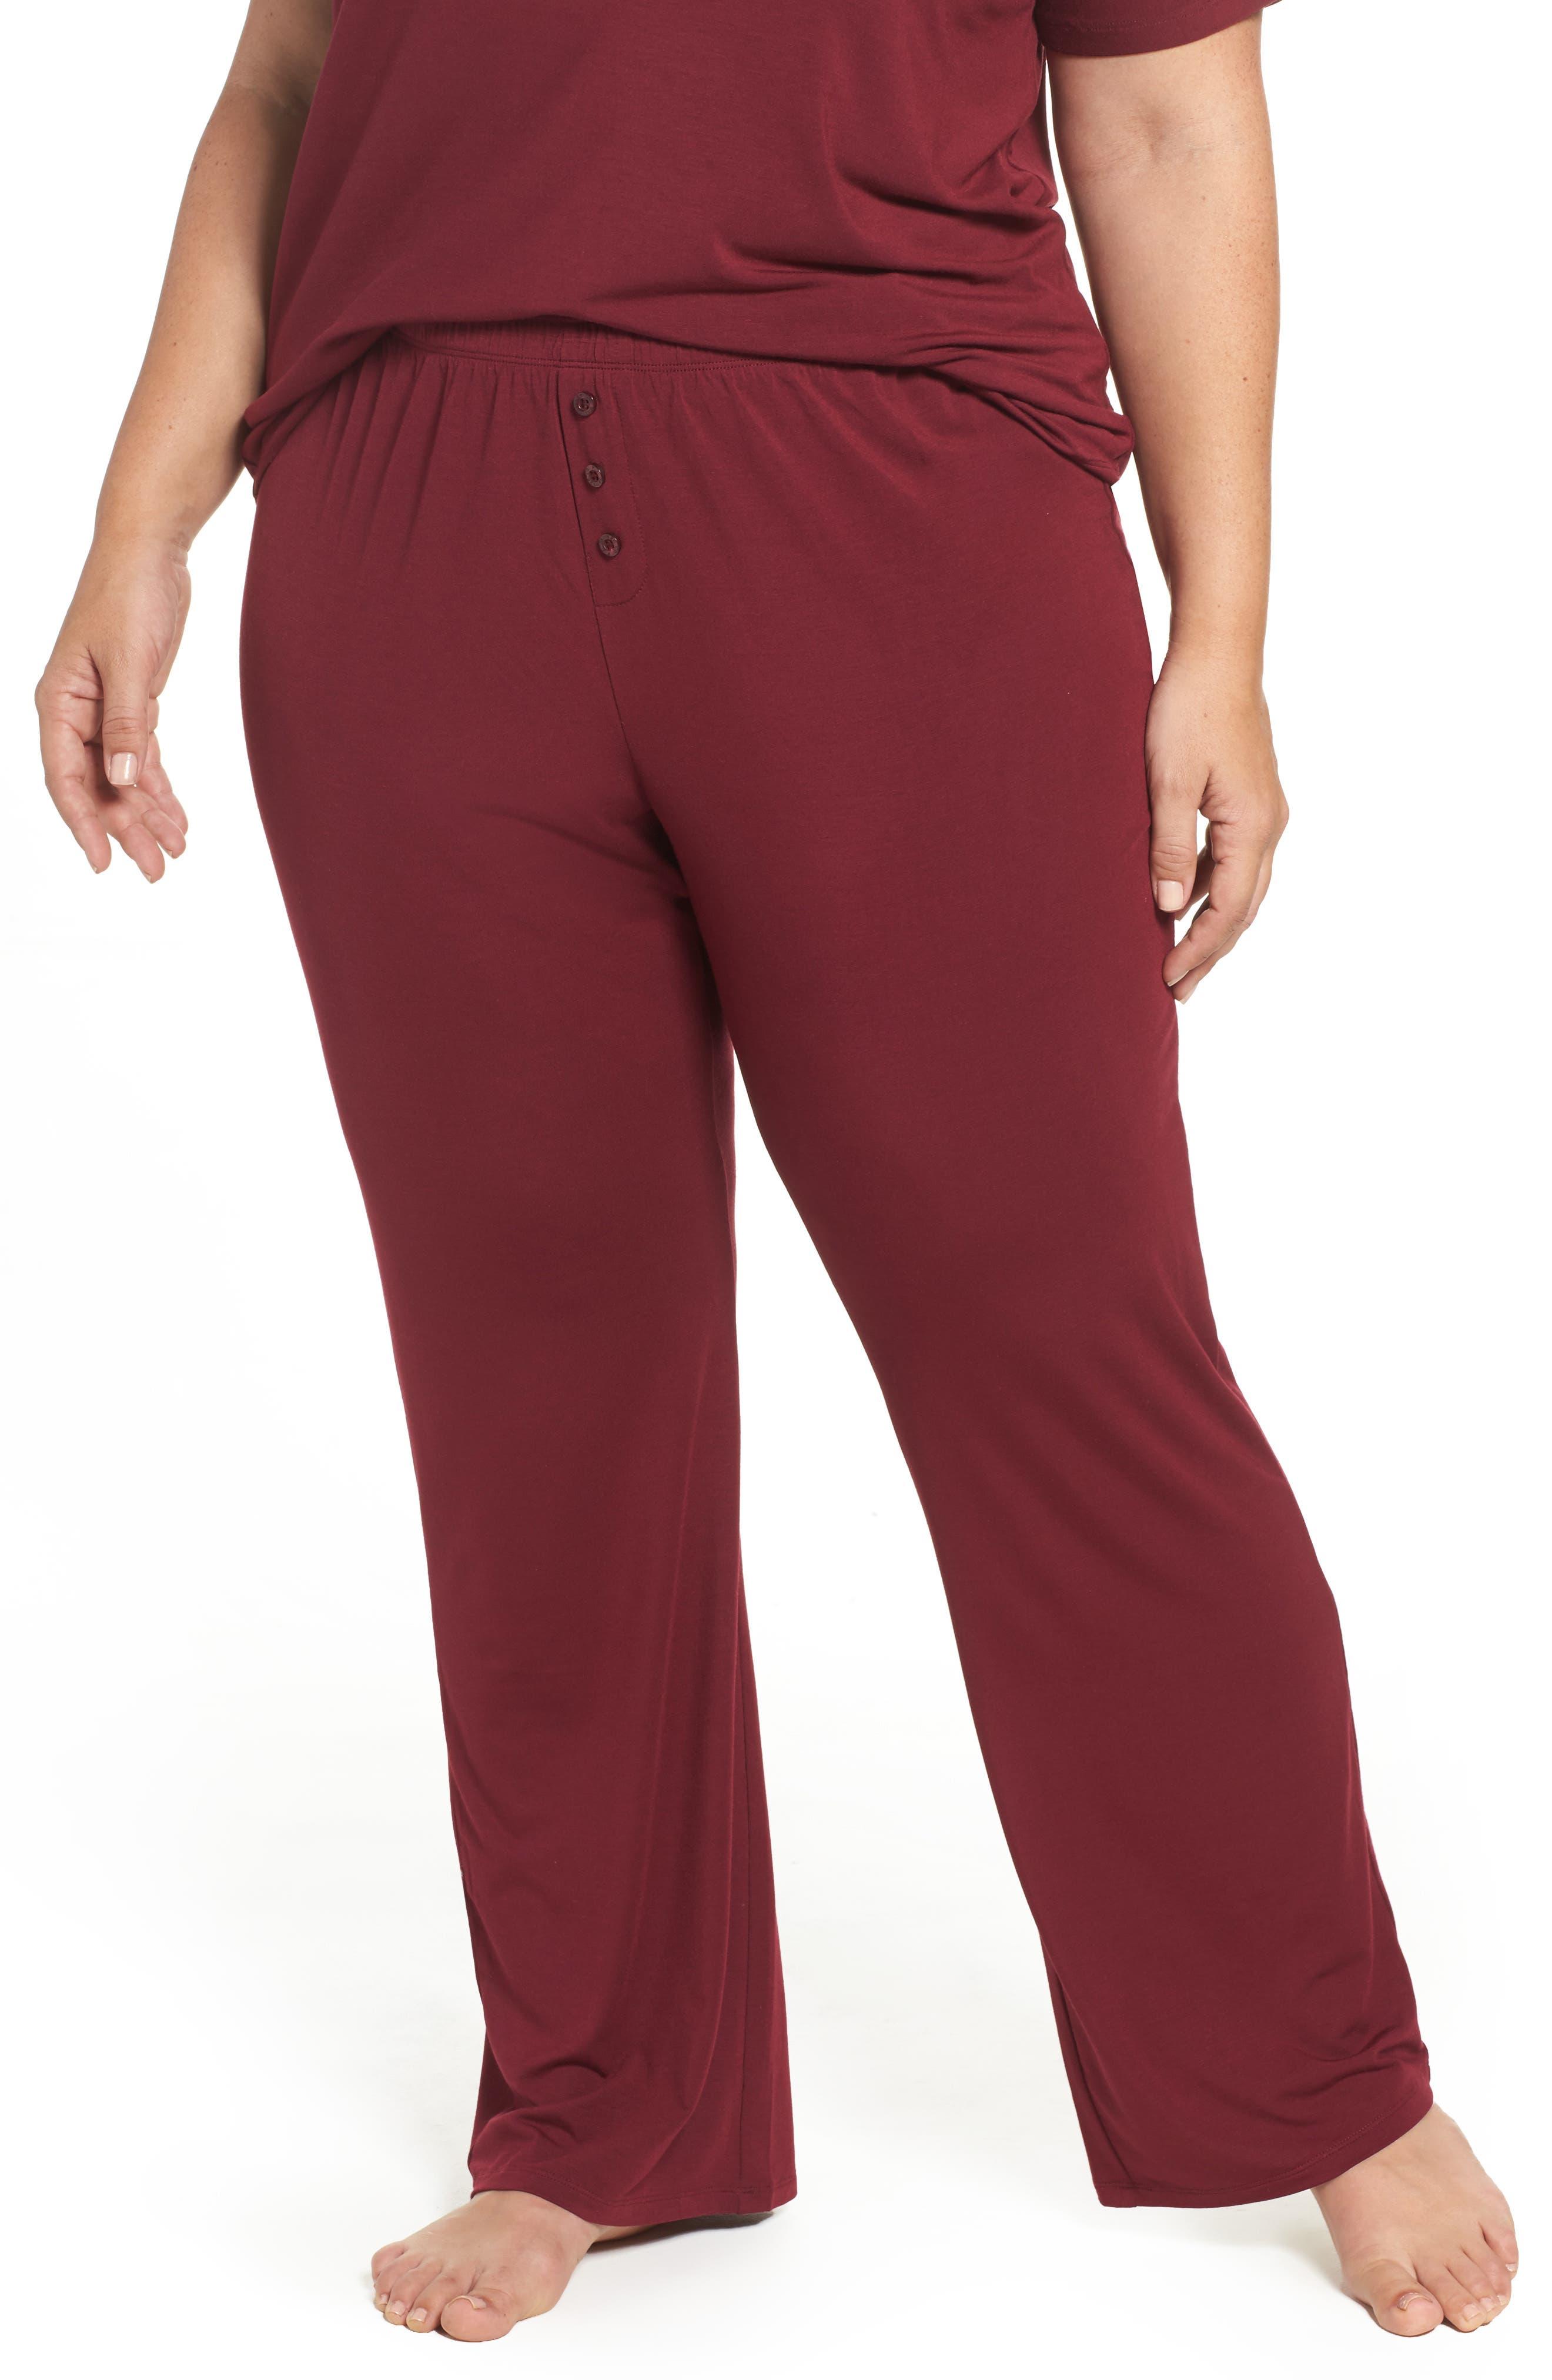 Alternate Image 1 Selected - PJ Salvage Lounge Pants (Plus Size)